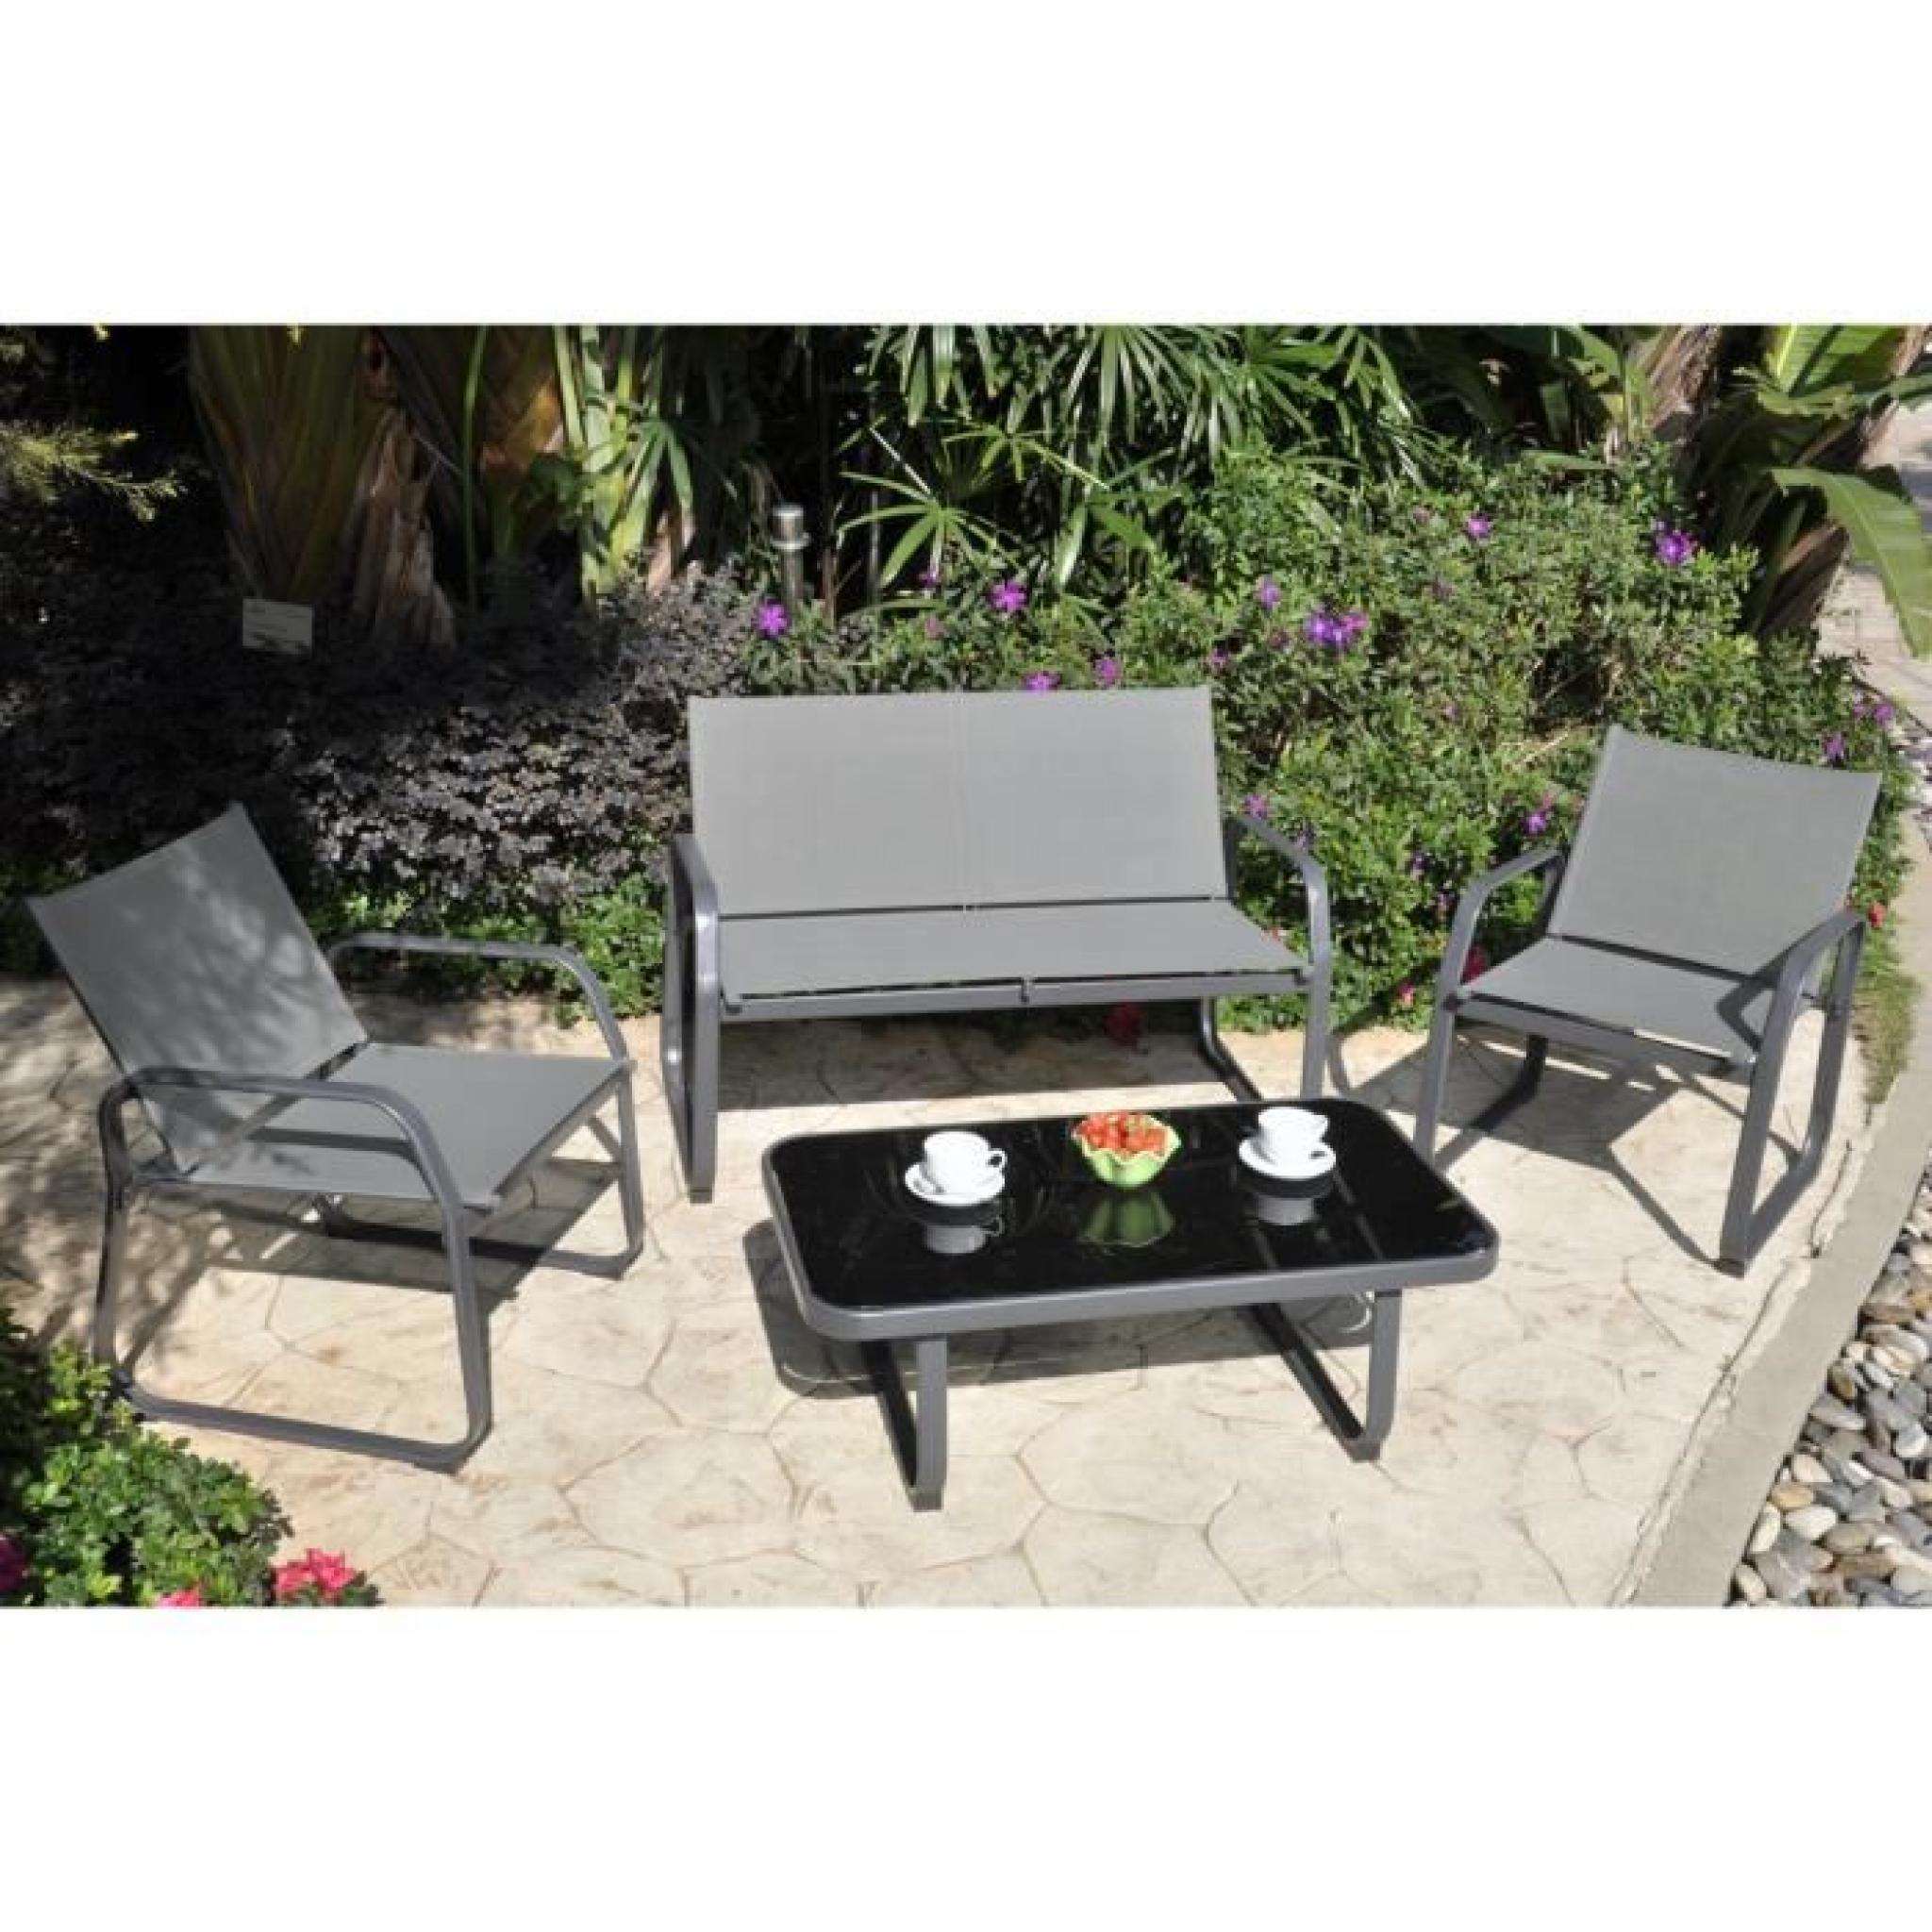 PALMERI Salon de jardin 1 canapé, 2 fauteuils et table basse